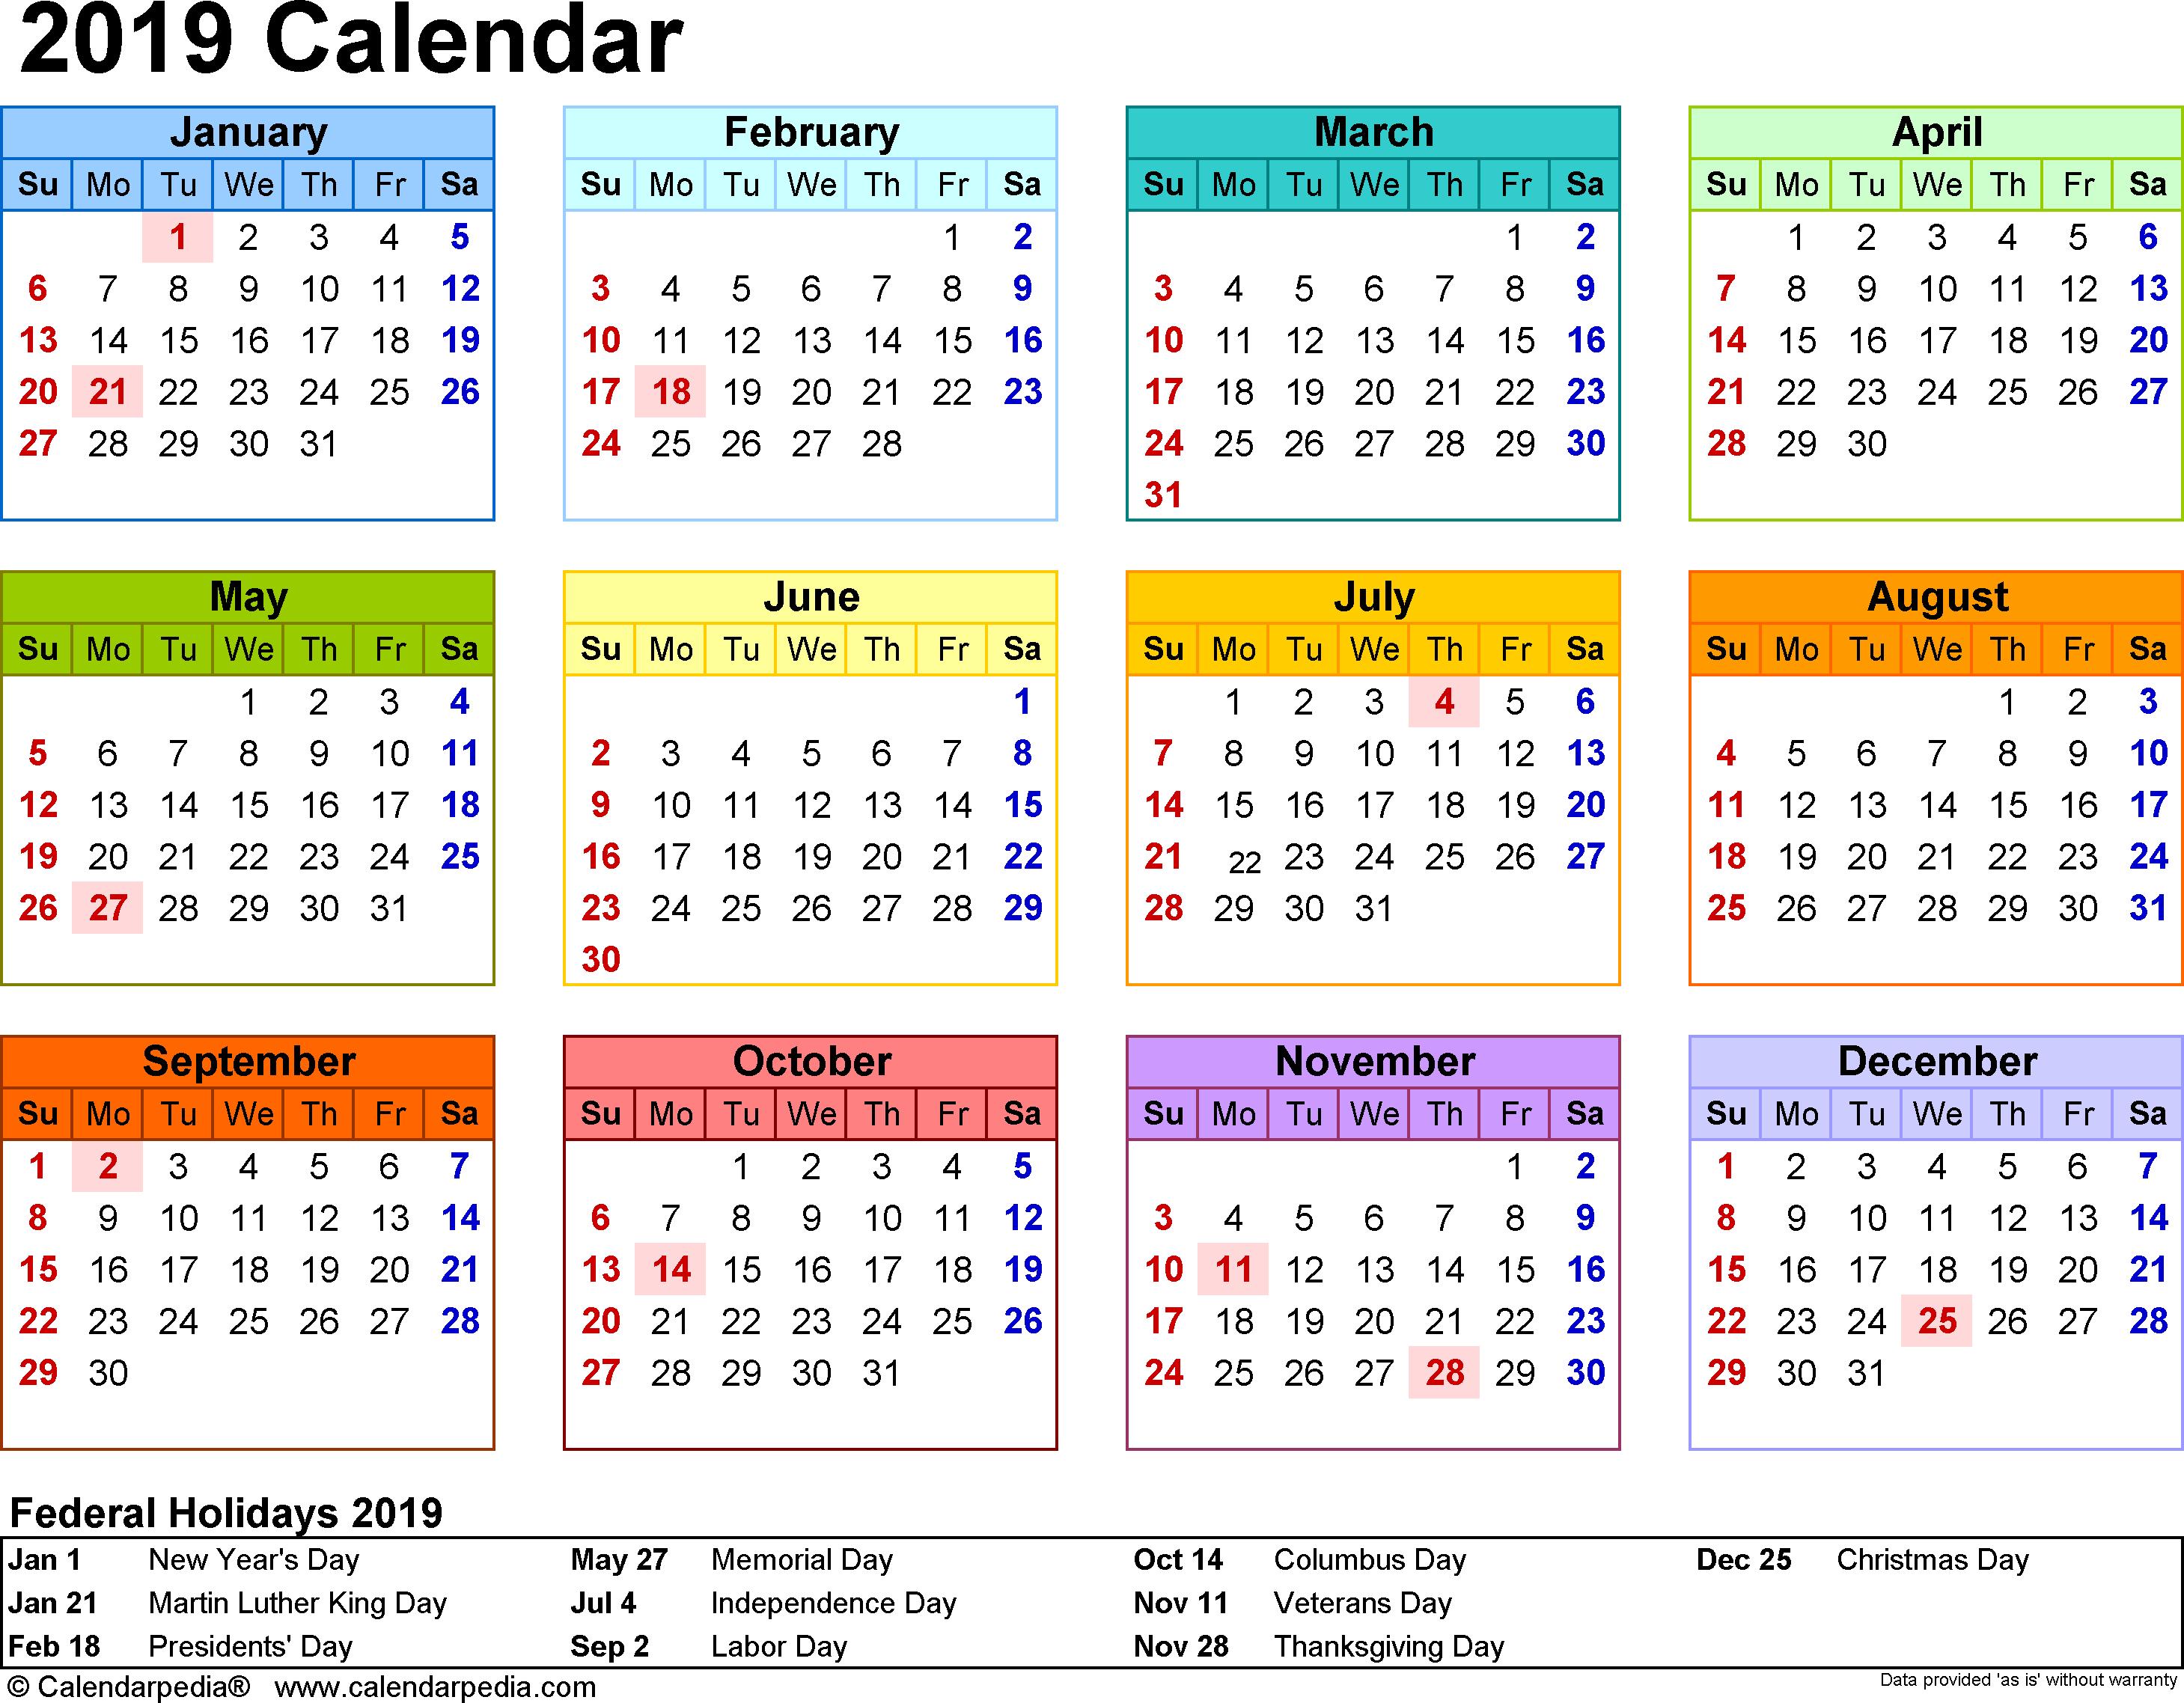 March 2019 Holiday Calendar Uk | 2019 Calendars | Calendar